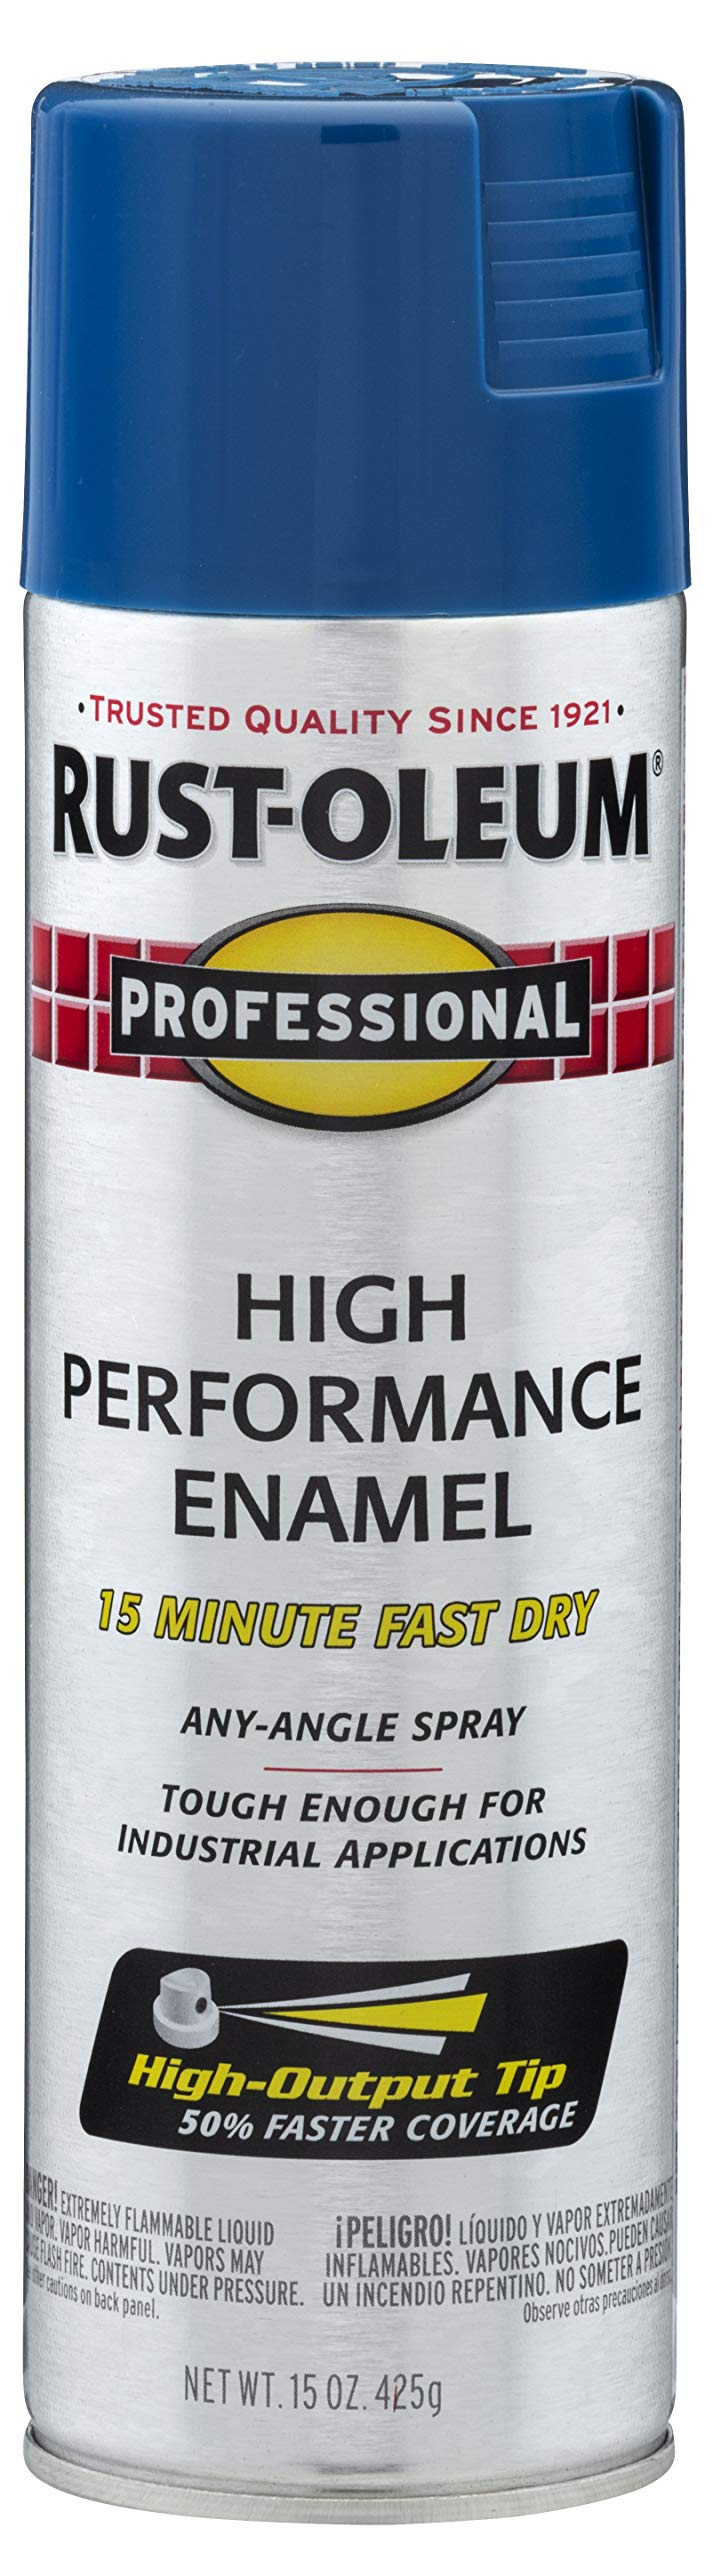 Rust-Oleum 7527838 Professional High Performance Enamel Spray Paint, 15 Oz, Gloss Royal Blue, 15 Ounce